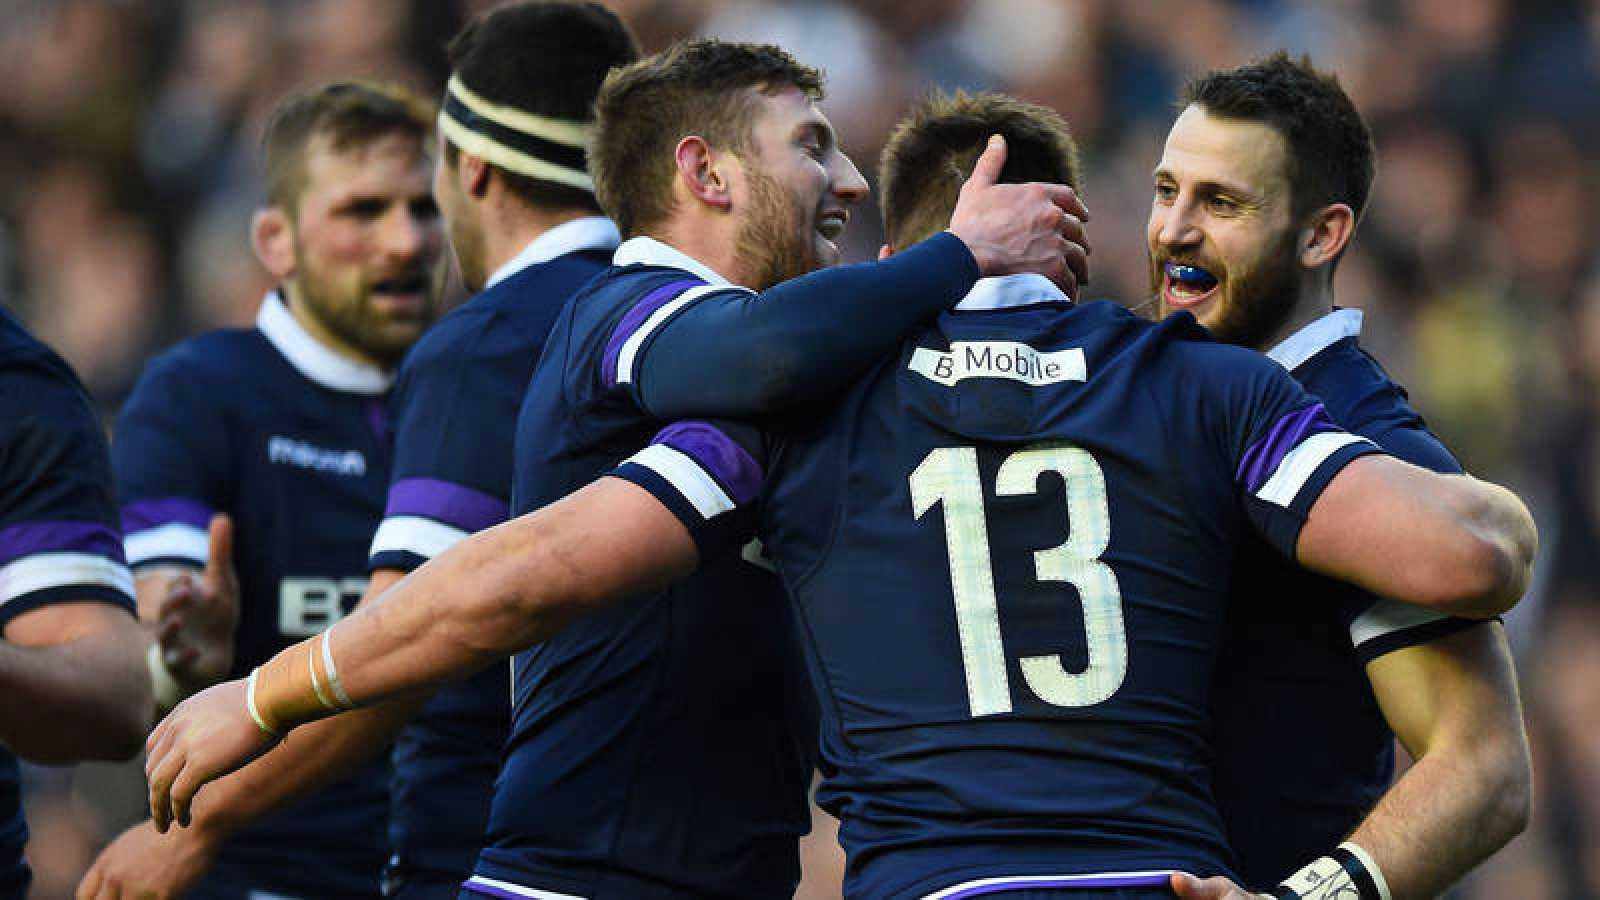 Escocia da la sorpresa y gana a Inglaterra